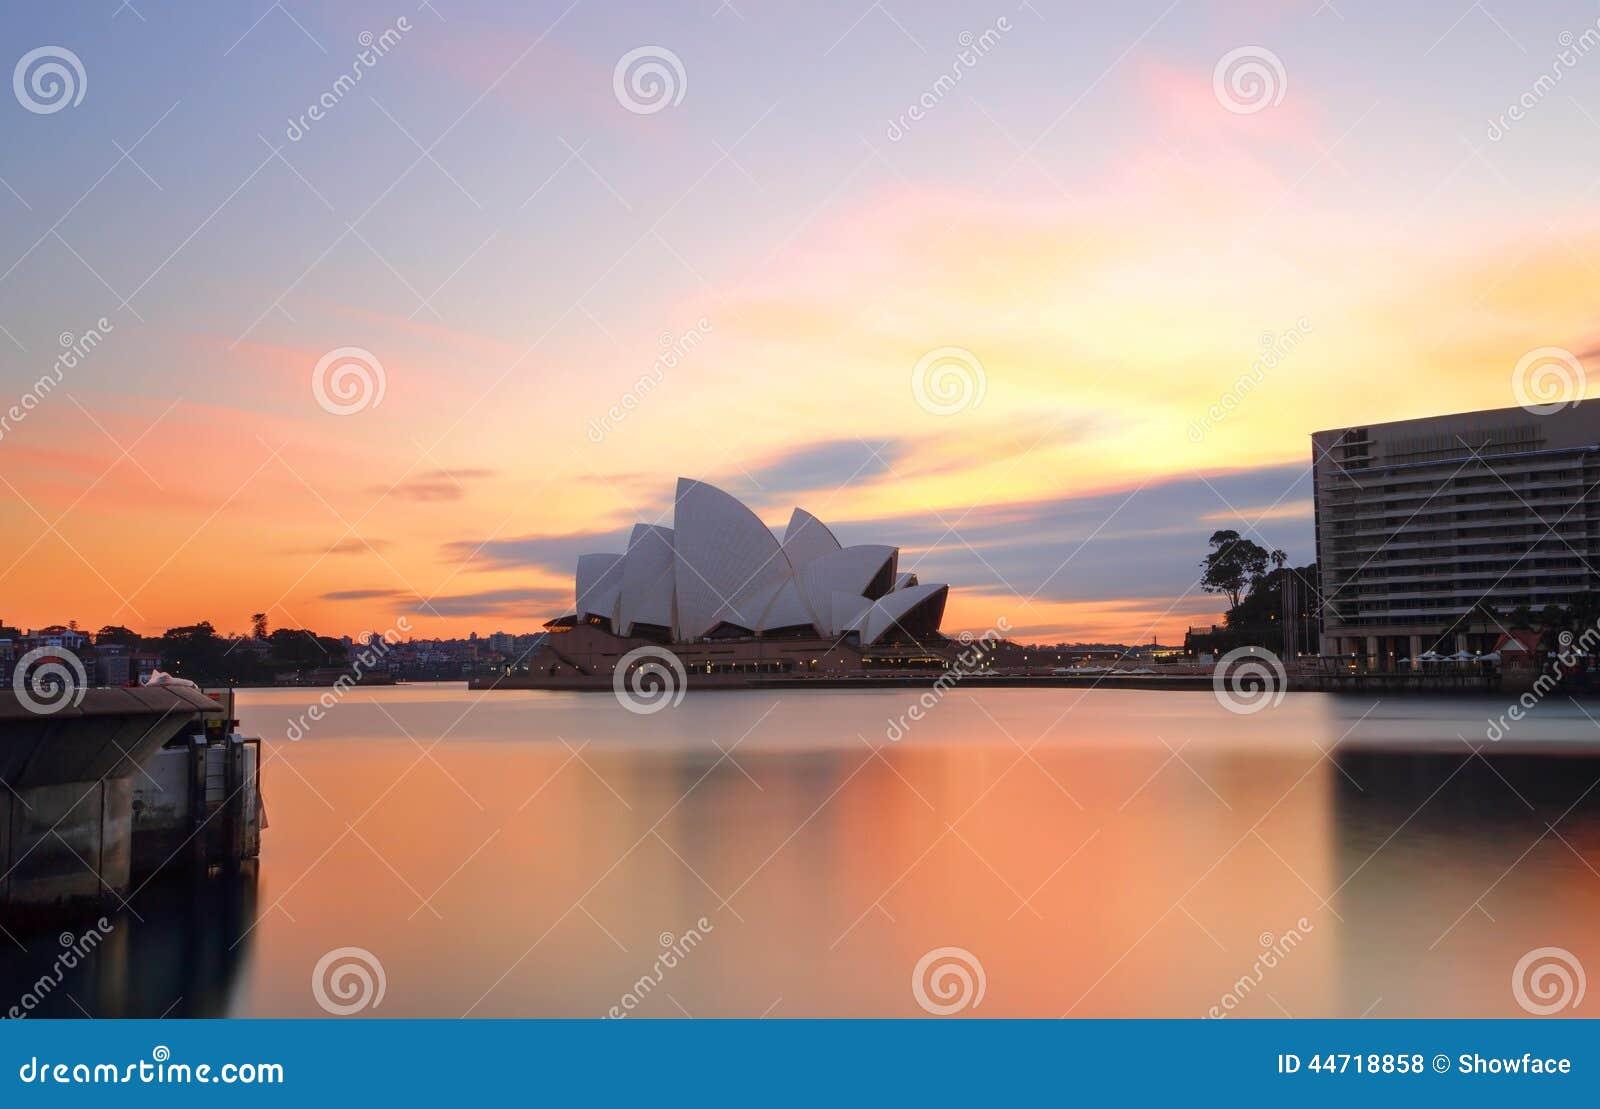 Upto date in Sydney